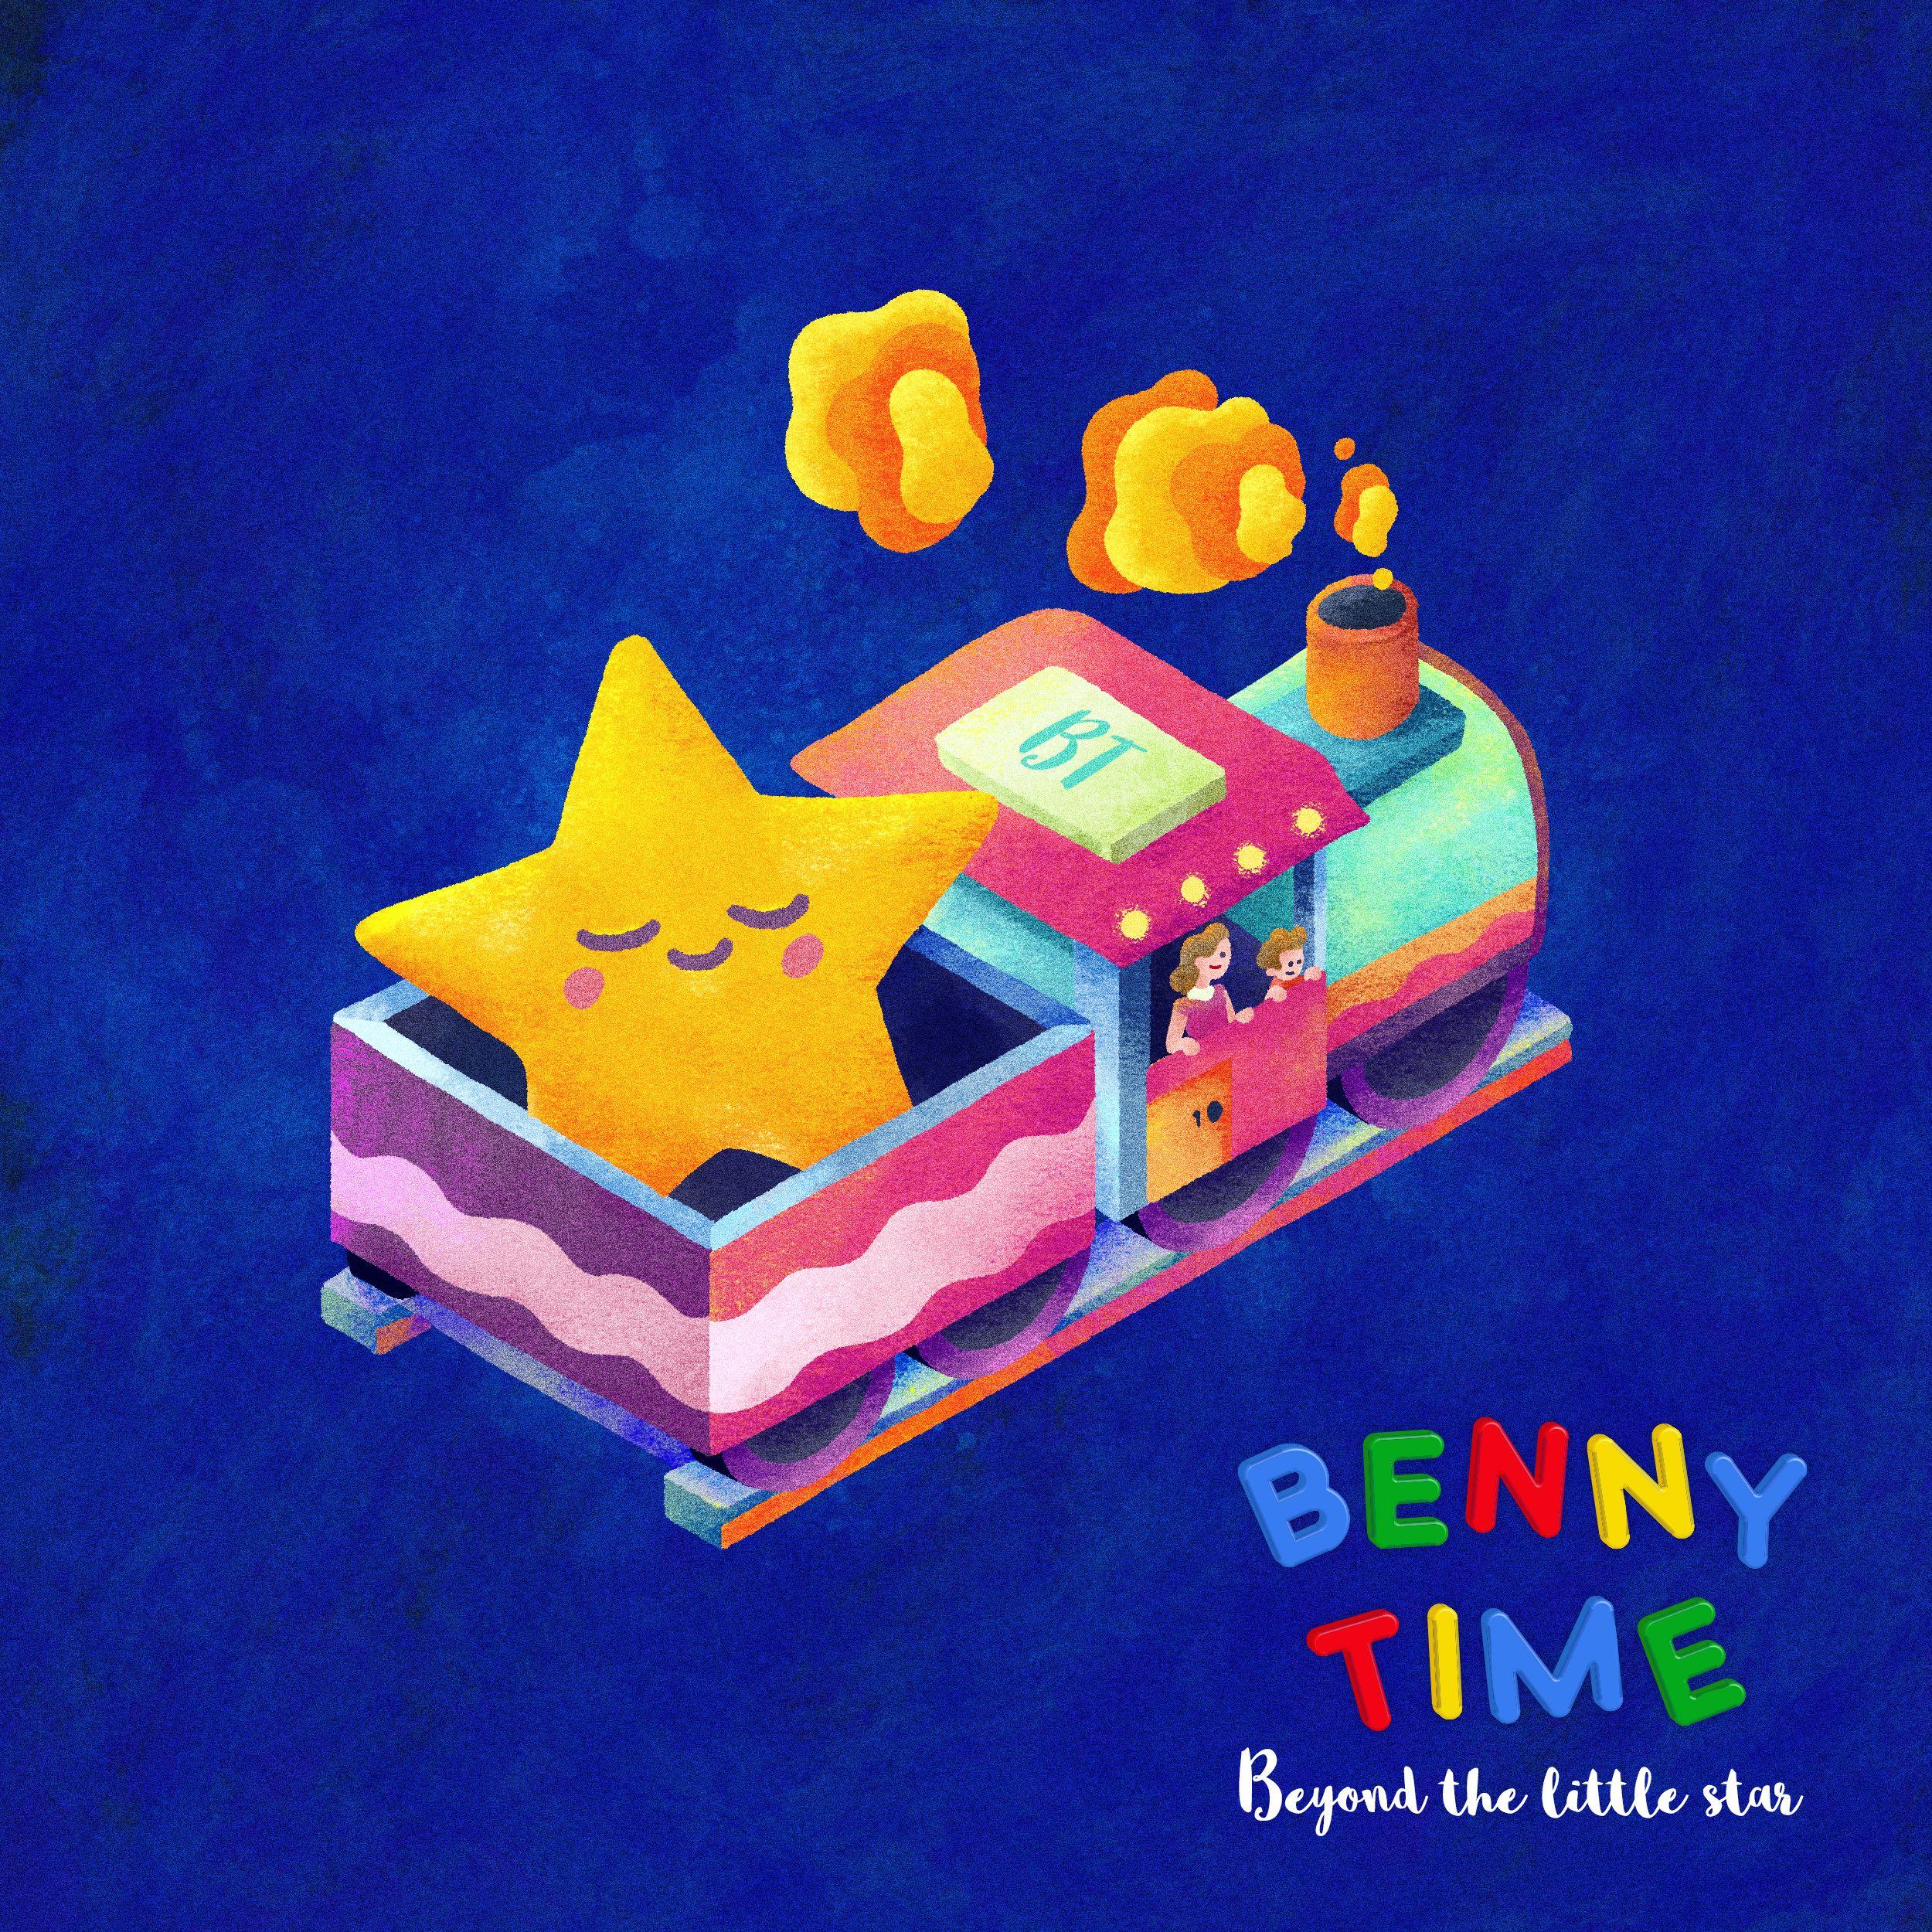 Beyond-the-little-star-original-nursery-rhymes-on-little-rockers-radio